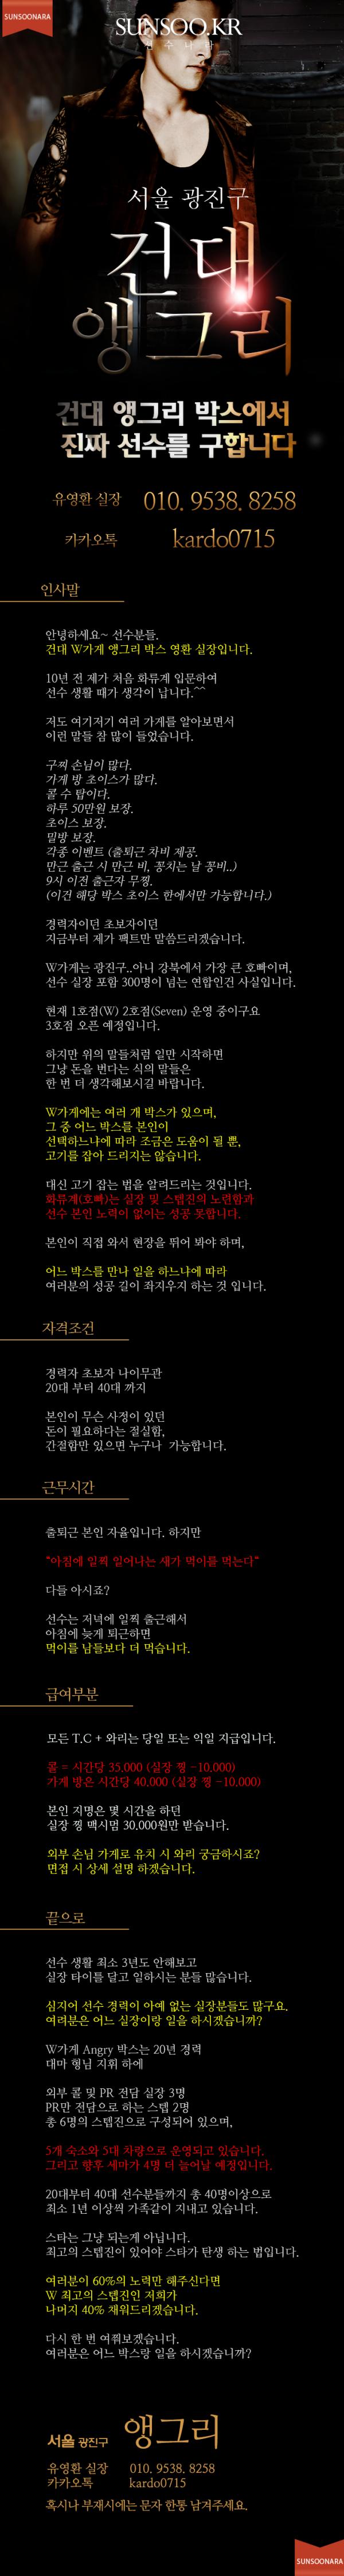 W 유영환.png